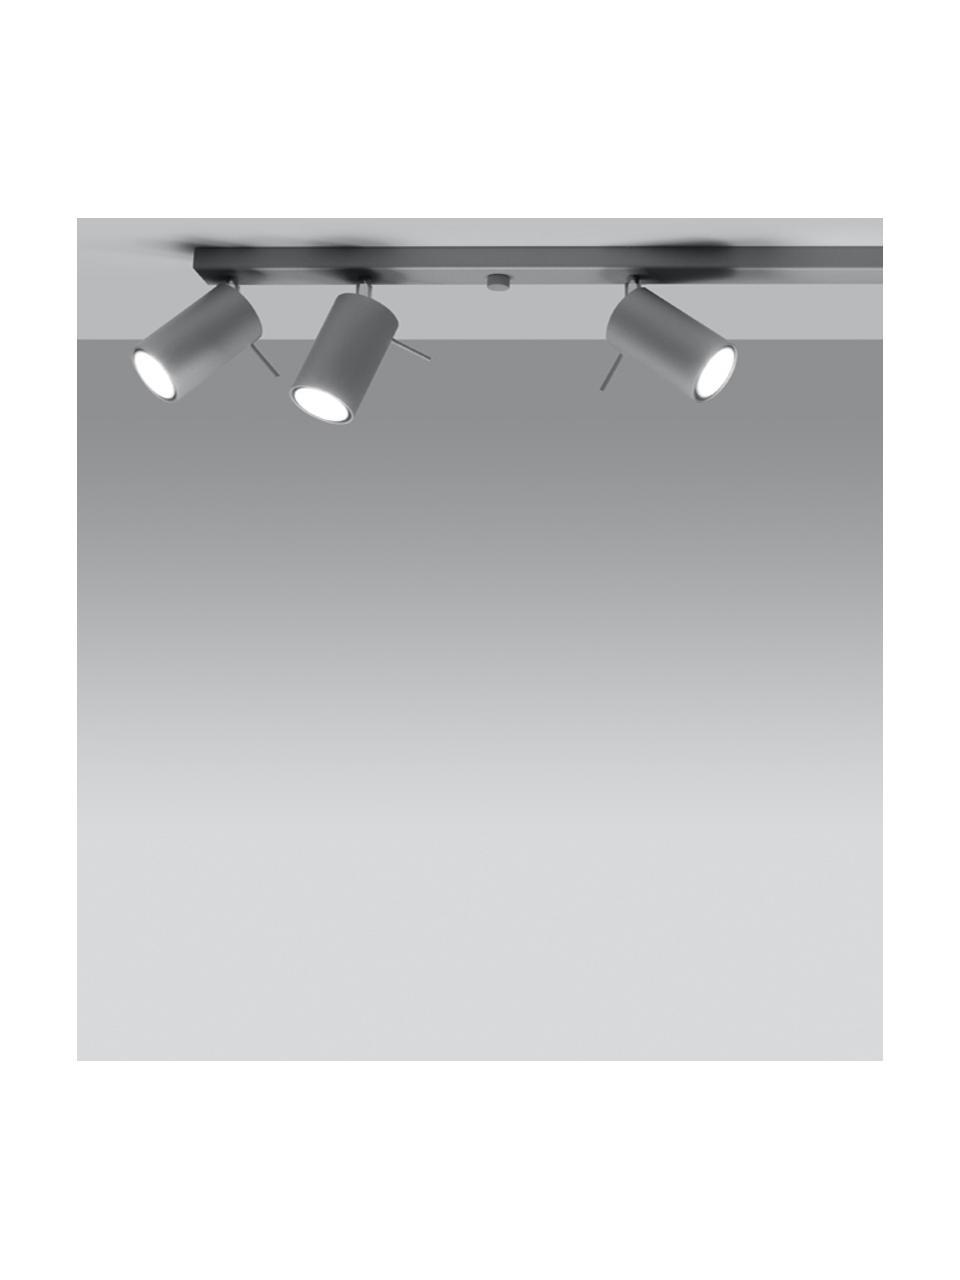 Großer Deckenstrahler Etna in Grau, Baldachin: Stahl, lackiert, Grau, 120 x 15 cm